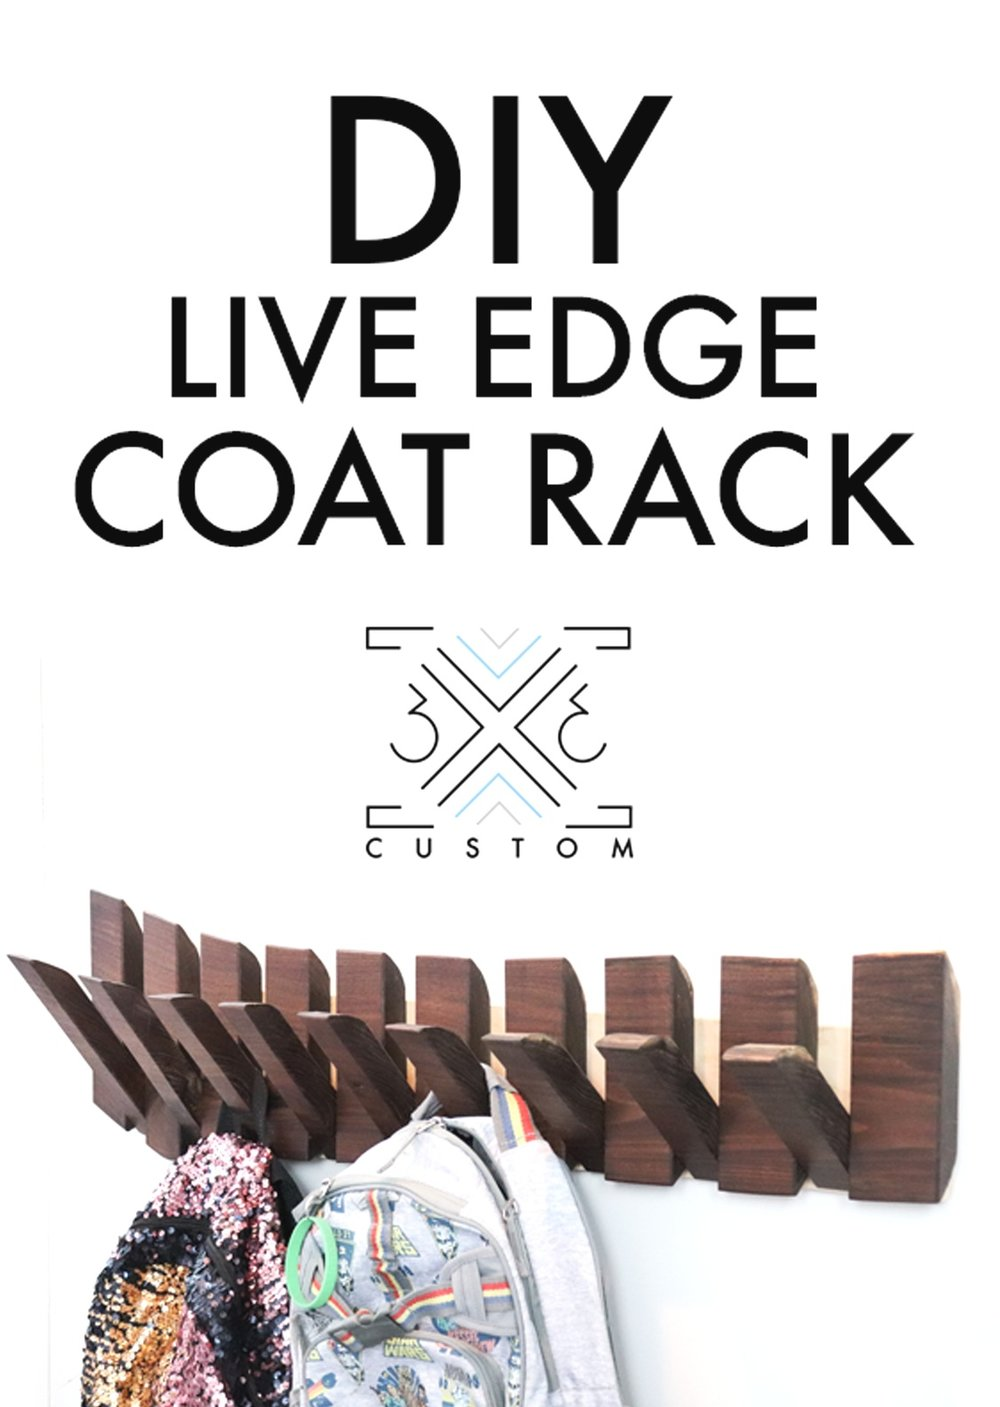 3x3 Custom Live Edge Coat Rack